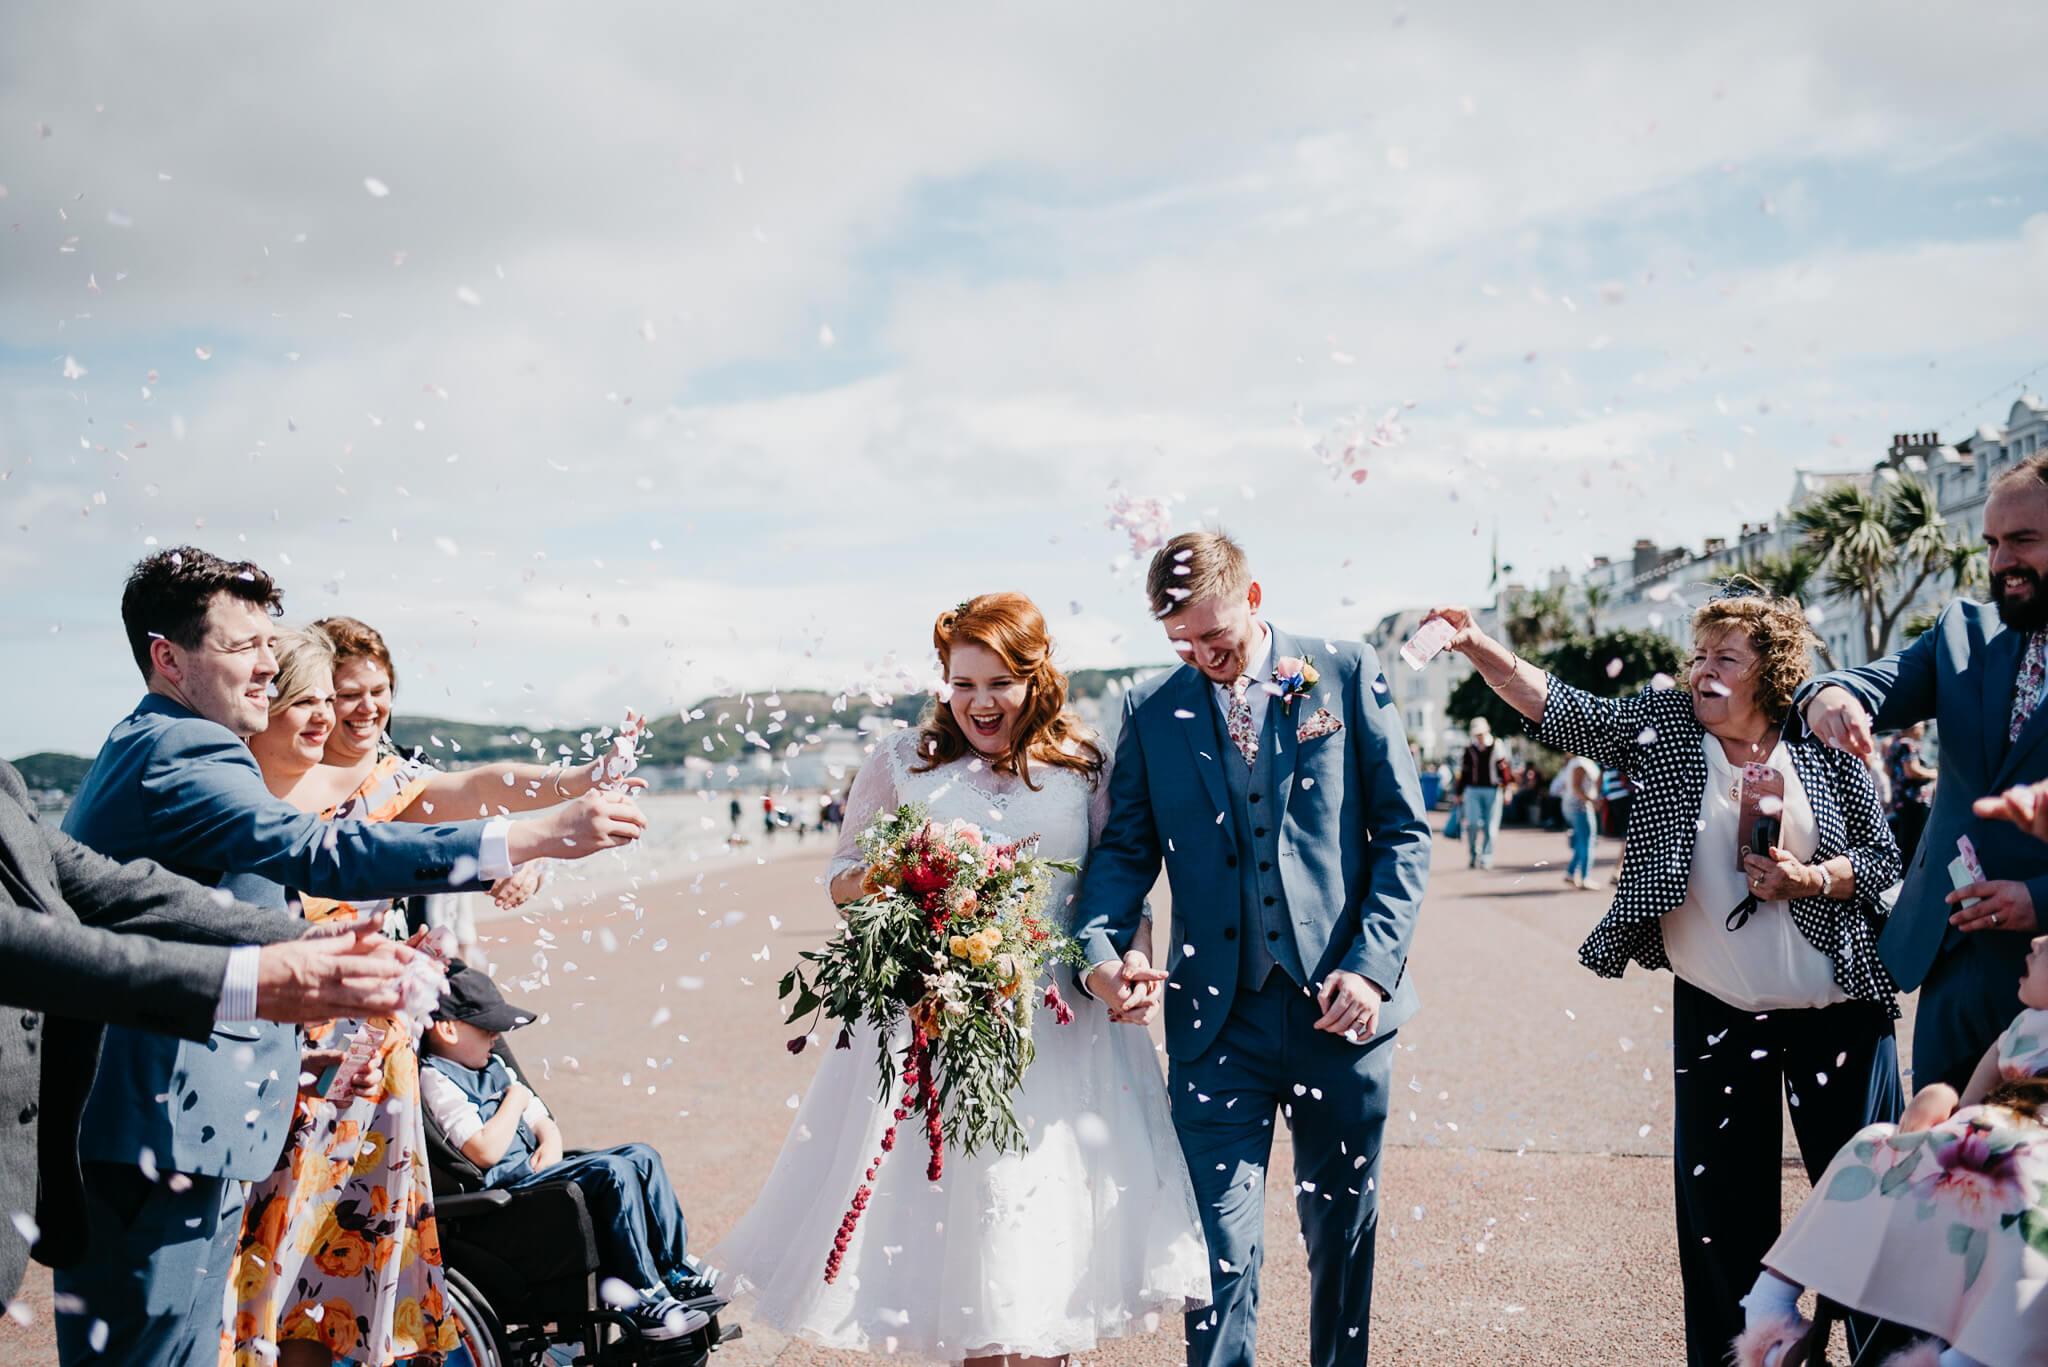 alternative couple walk through confetti throw at Llandudno Promenade